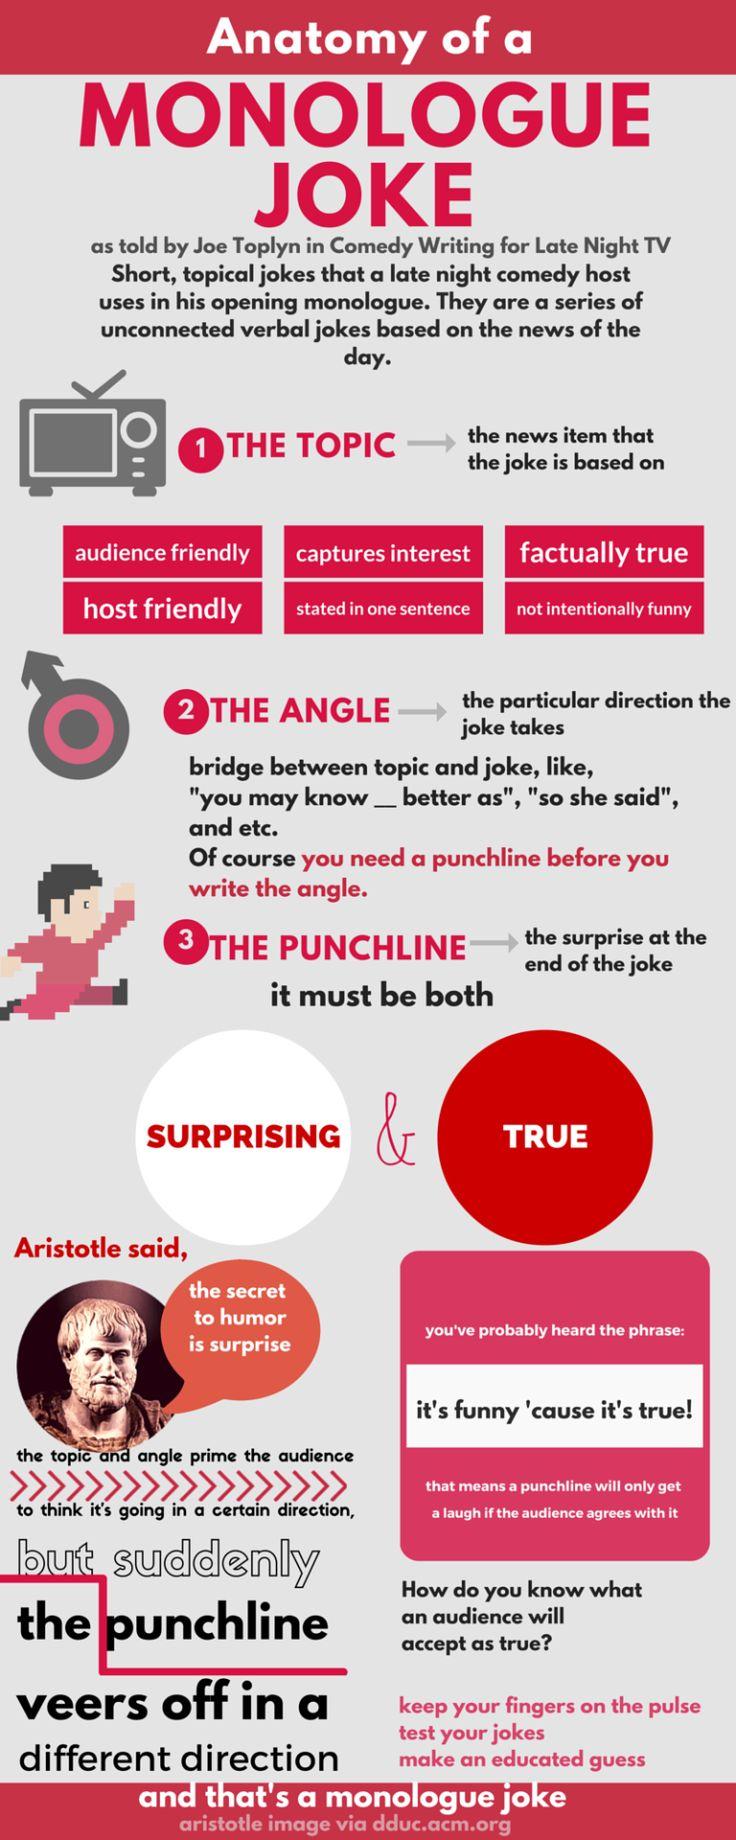 The Anatomy of a Monologue Joke, based on Joe Toplyn's Comedy Writing for Late Night TV